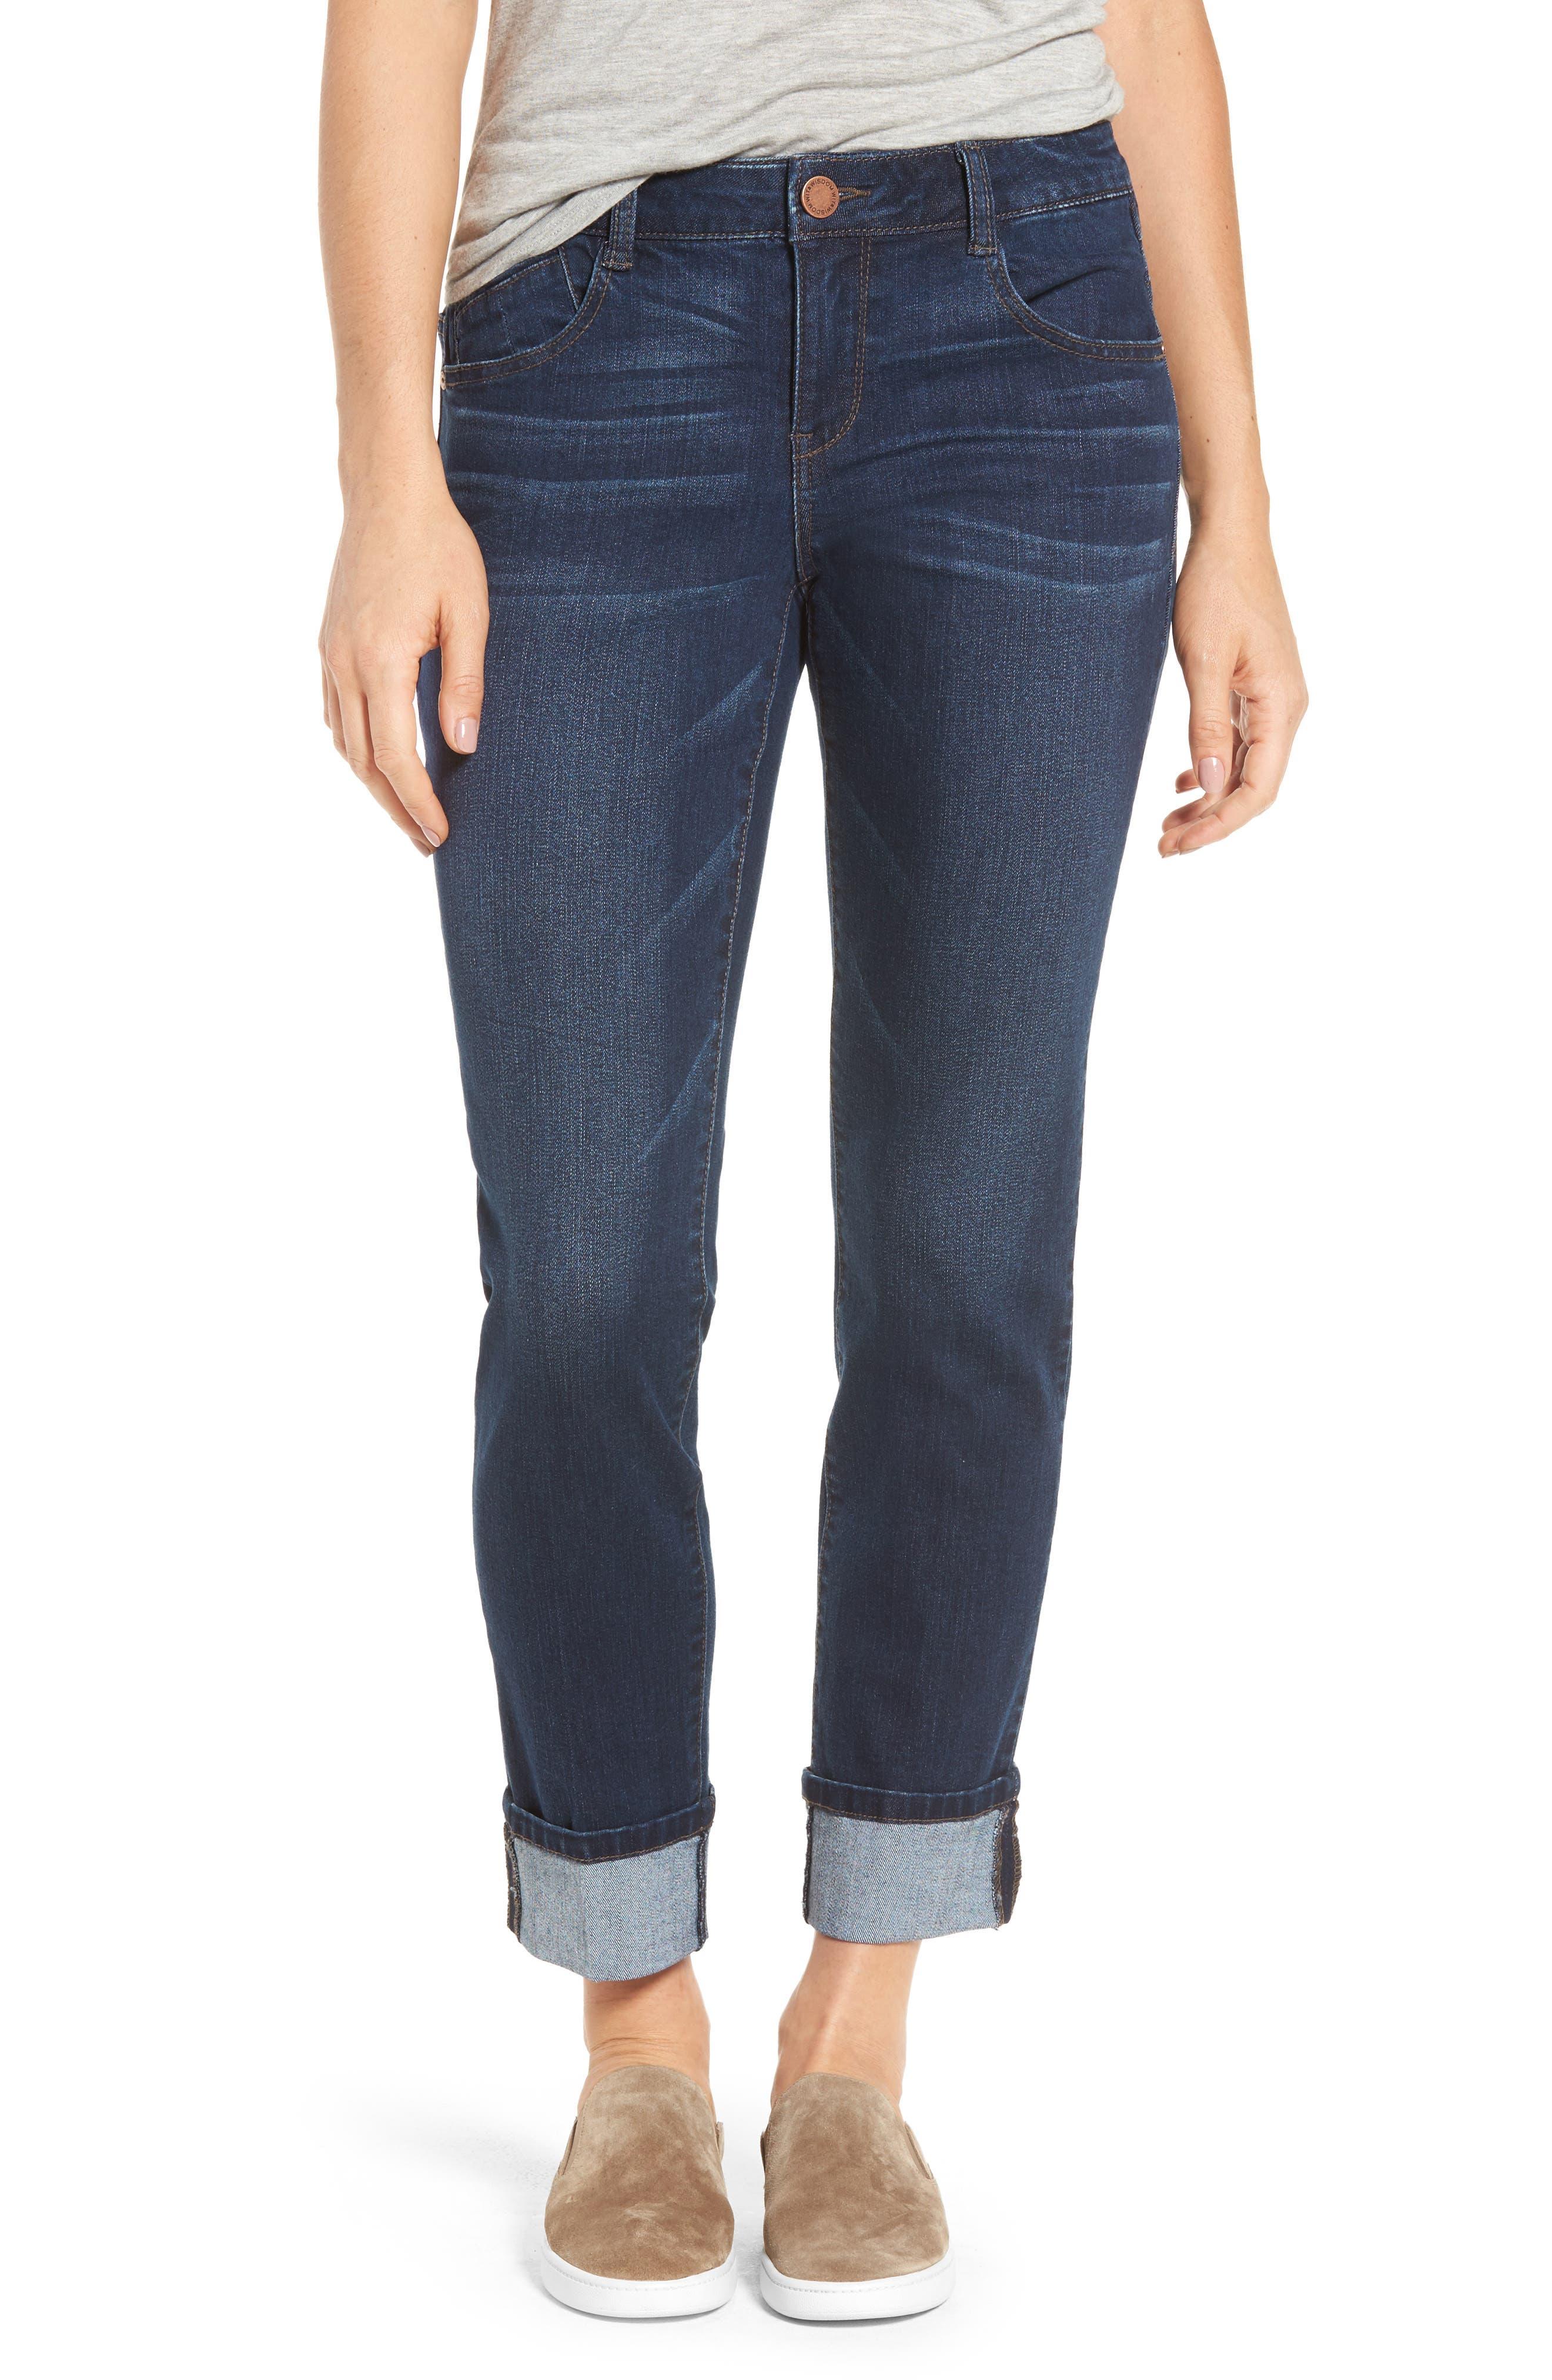 Wit & Wisdom Flex-ellent Boyfriend Jeans (Nordstrom Exclusive)